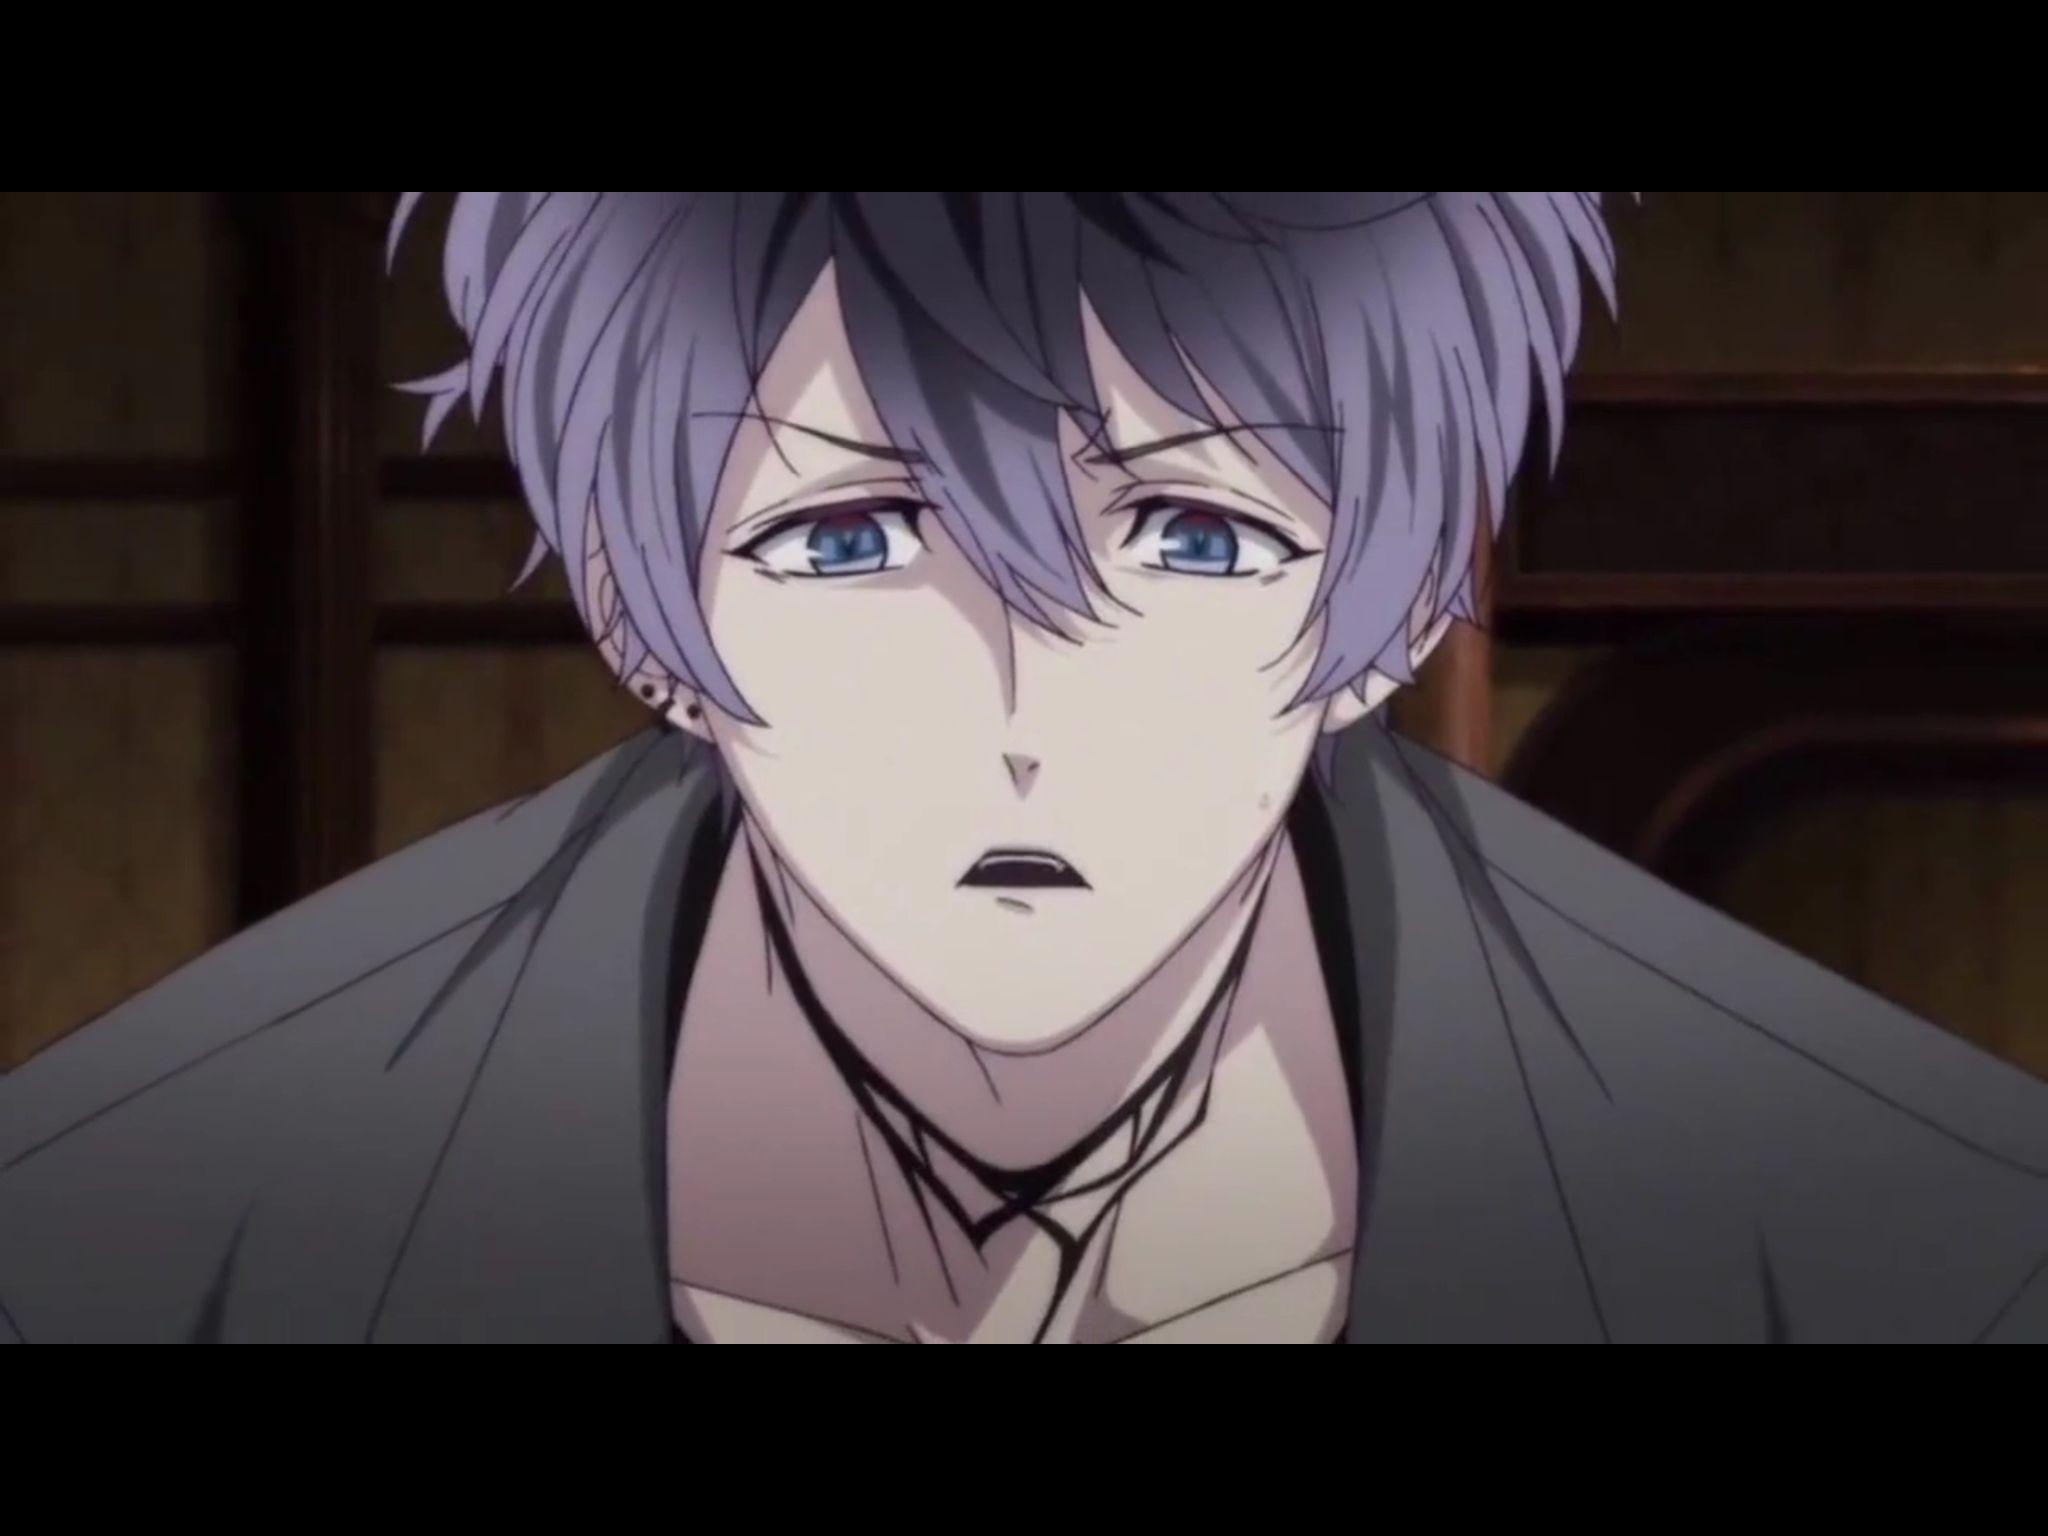 Ruki Mukami Diabolik Lovers more blood Anime and Manga